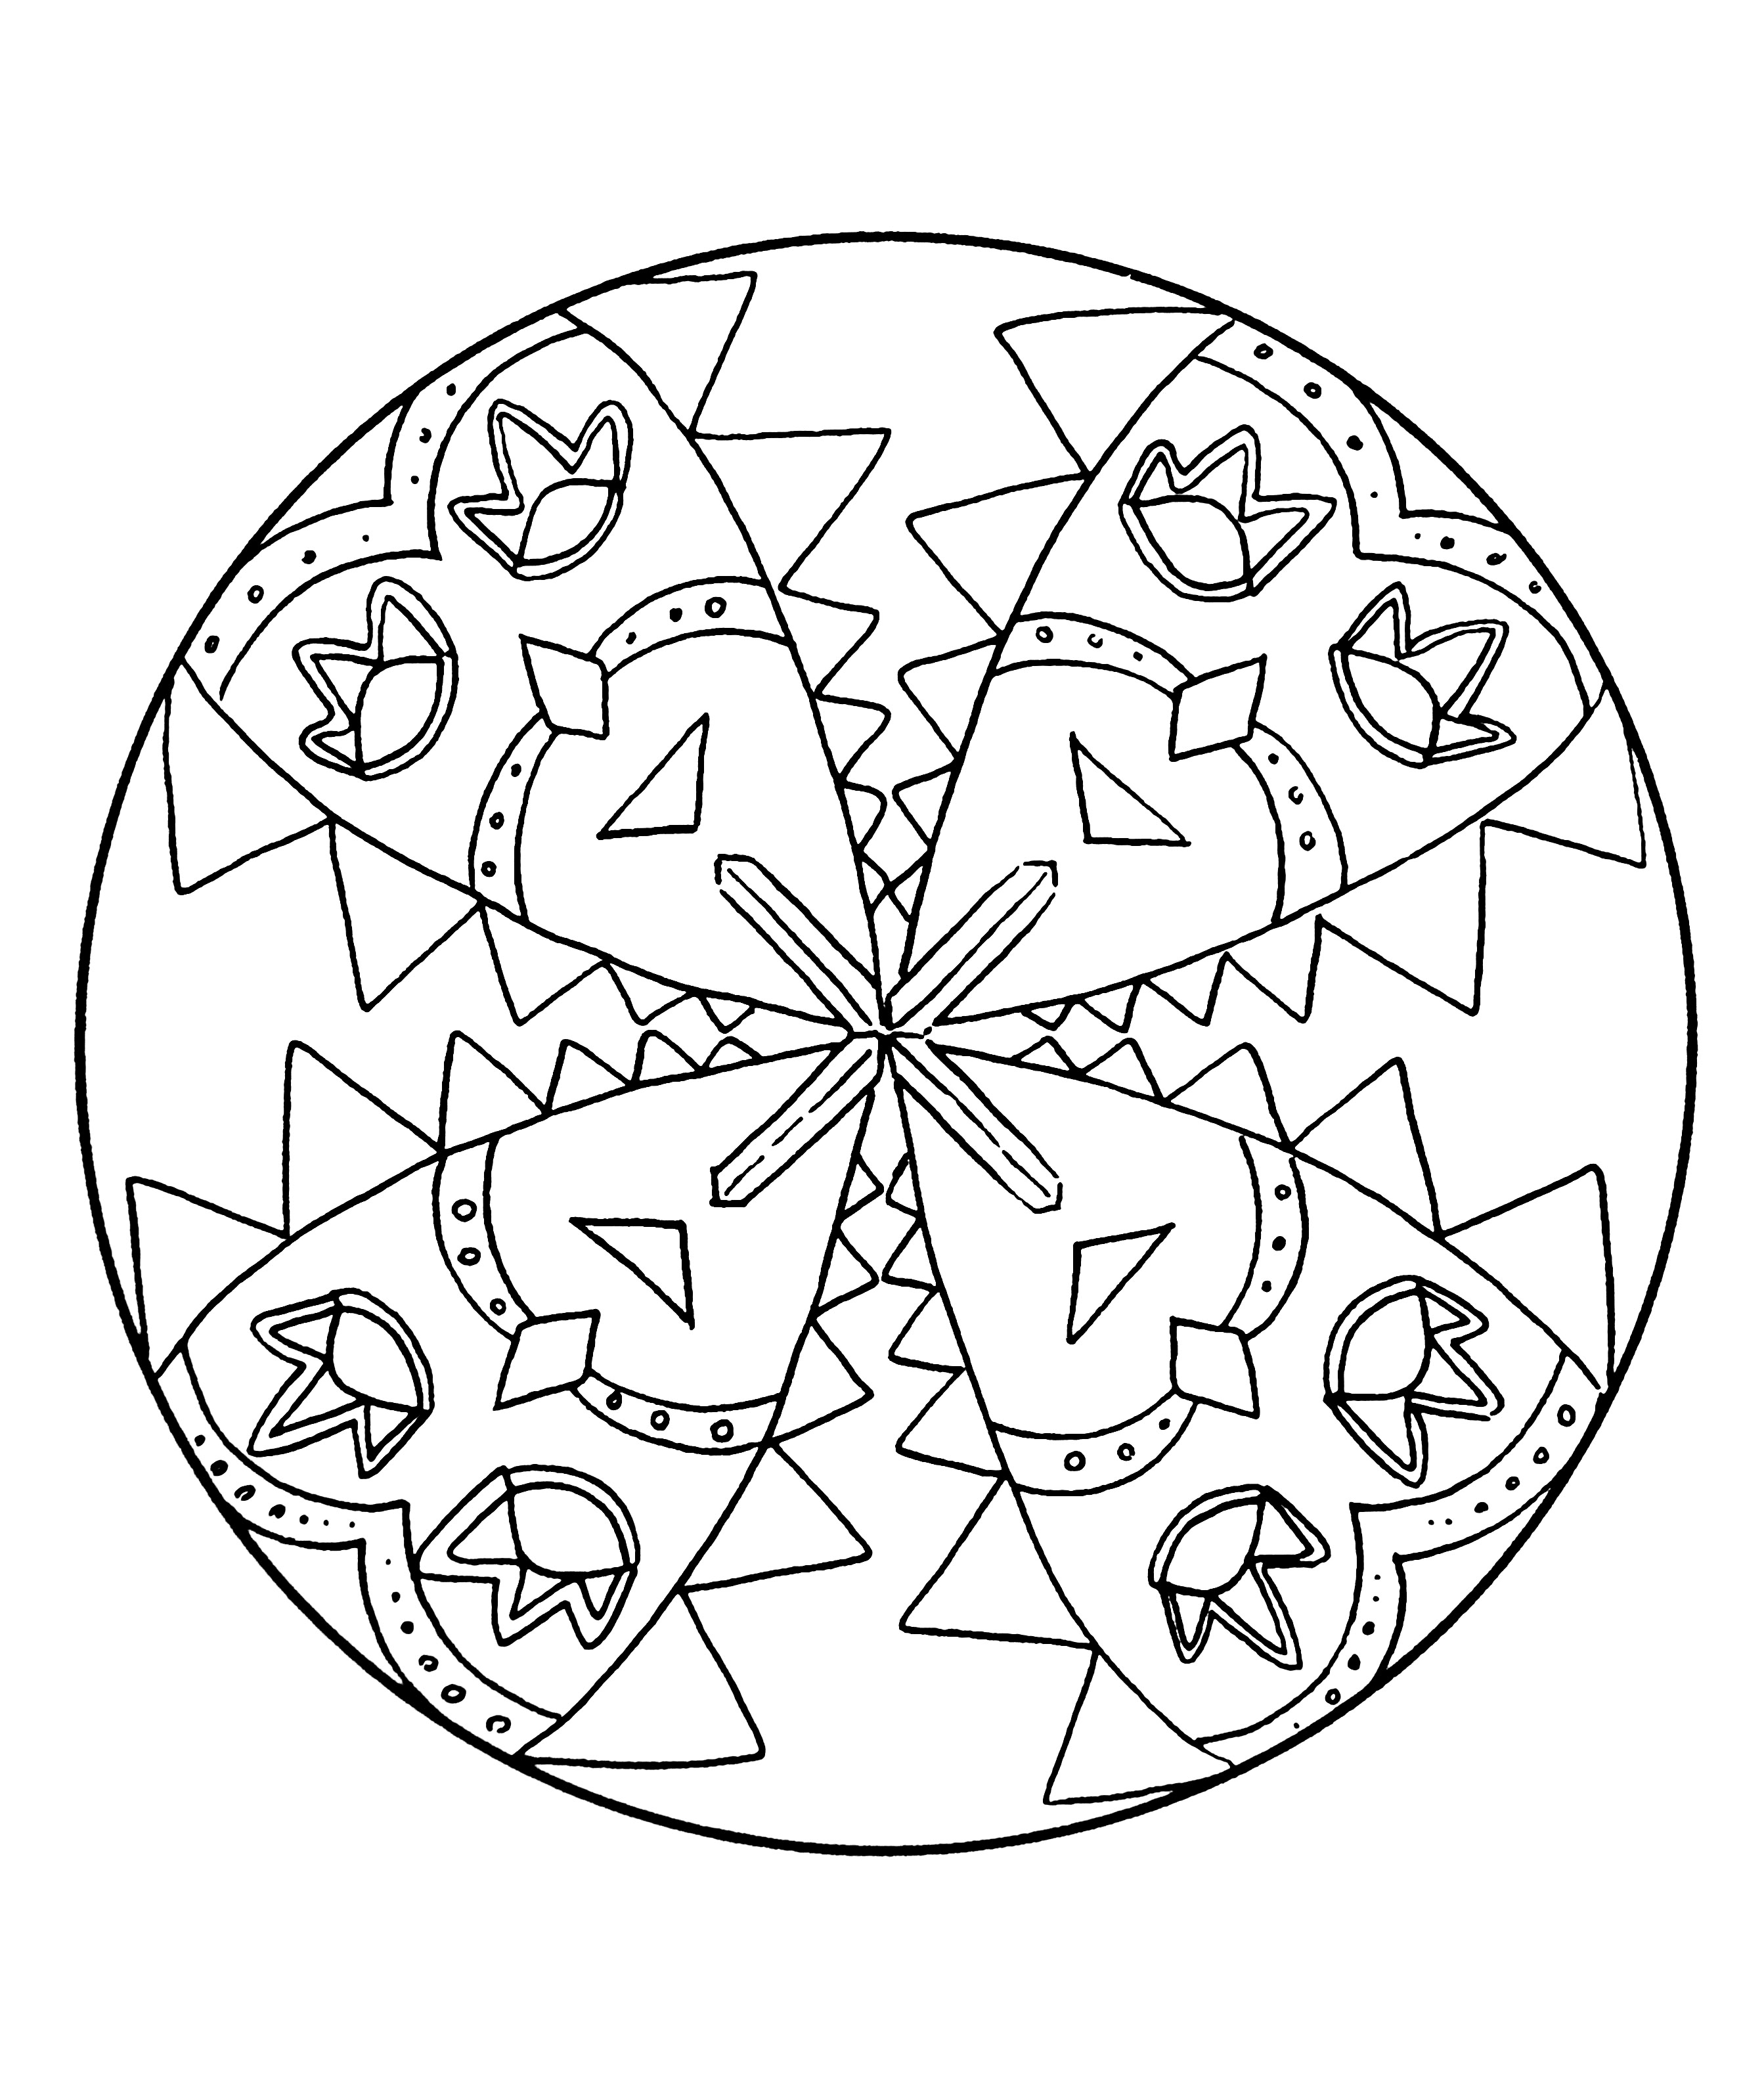 Simple mandala 25 m alas coloring pages for kids to for Simple mandala coloring page